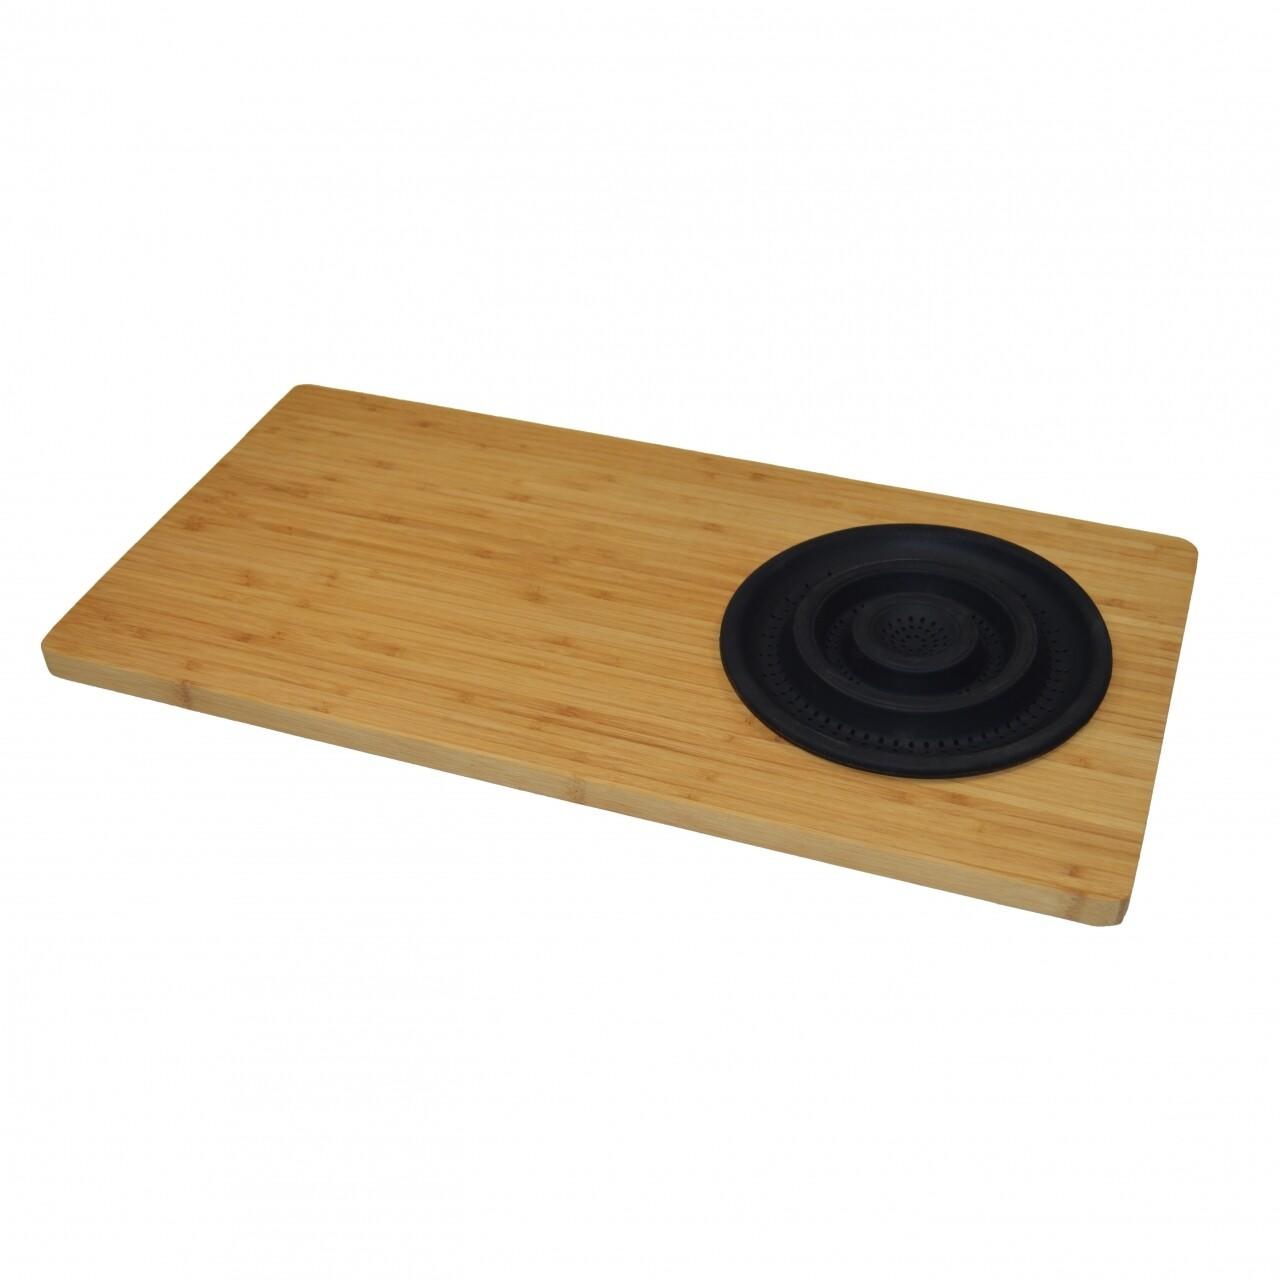 Tocator cu sita Black, Jocca, 29 x 59 x 1.8 cm, bambus/silicon natur/negru